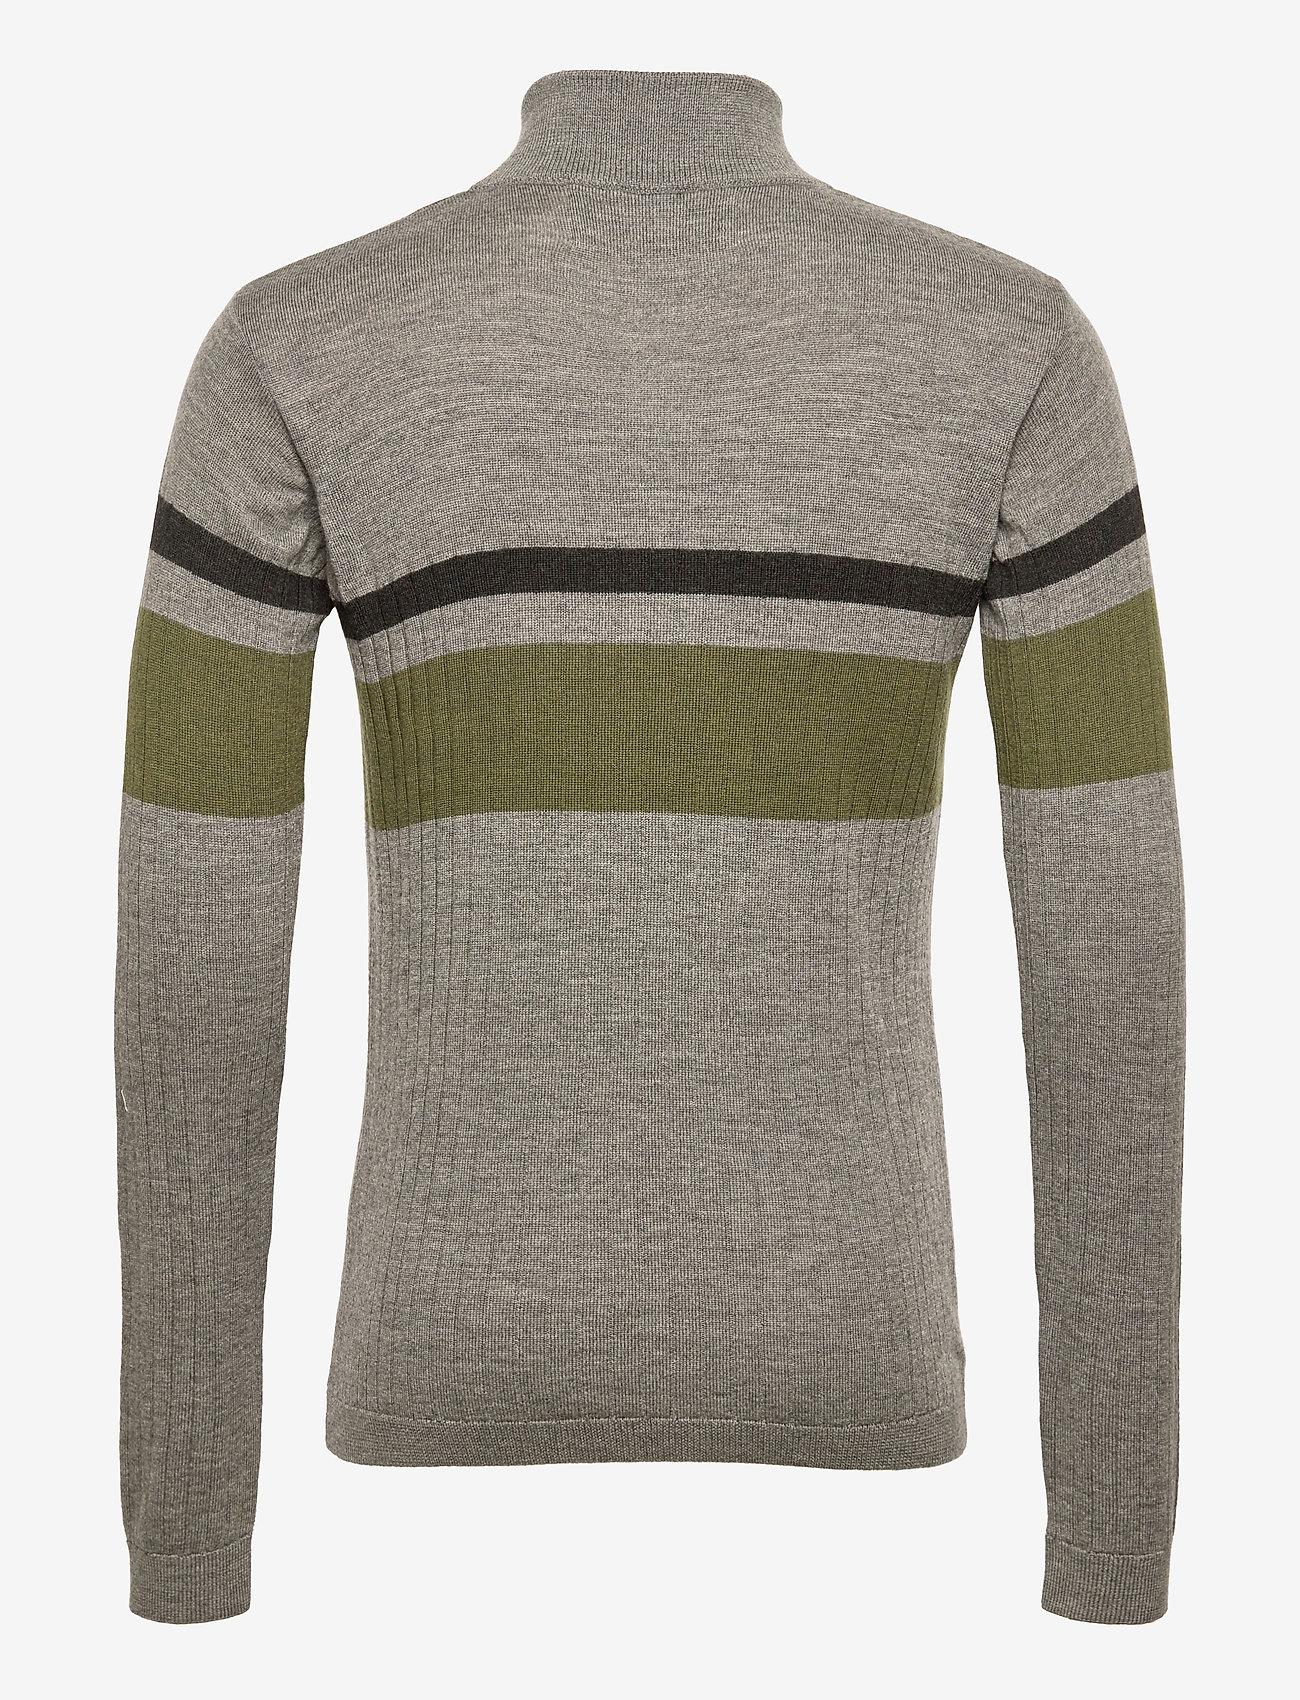 HAN Kjøbenhavn - Half Zip Long Sleeve - truien met halve rits - grey - 1